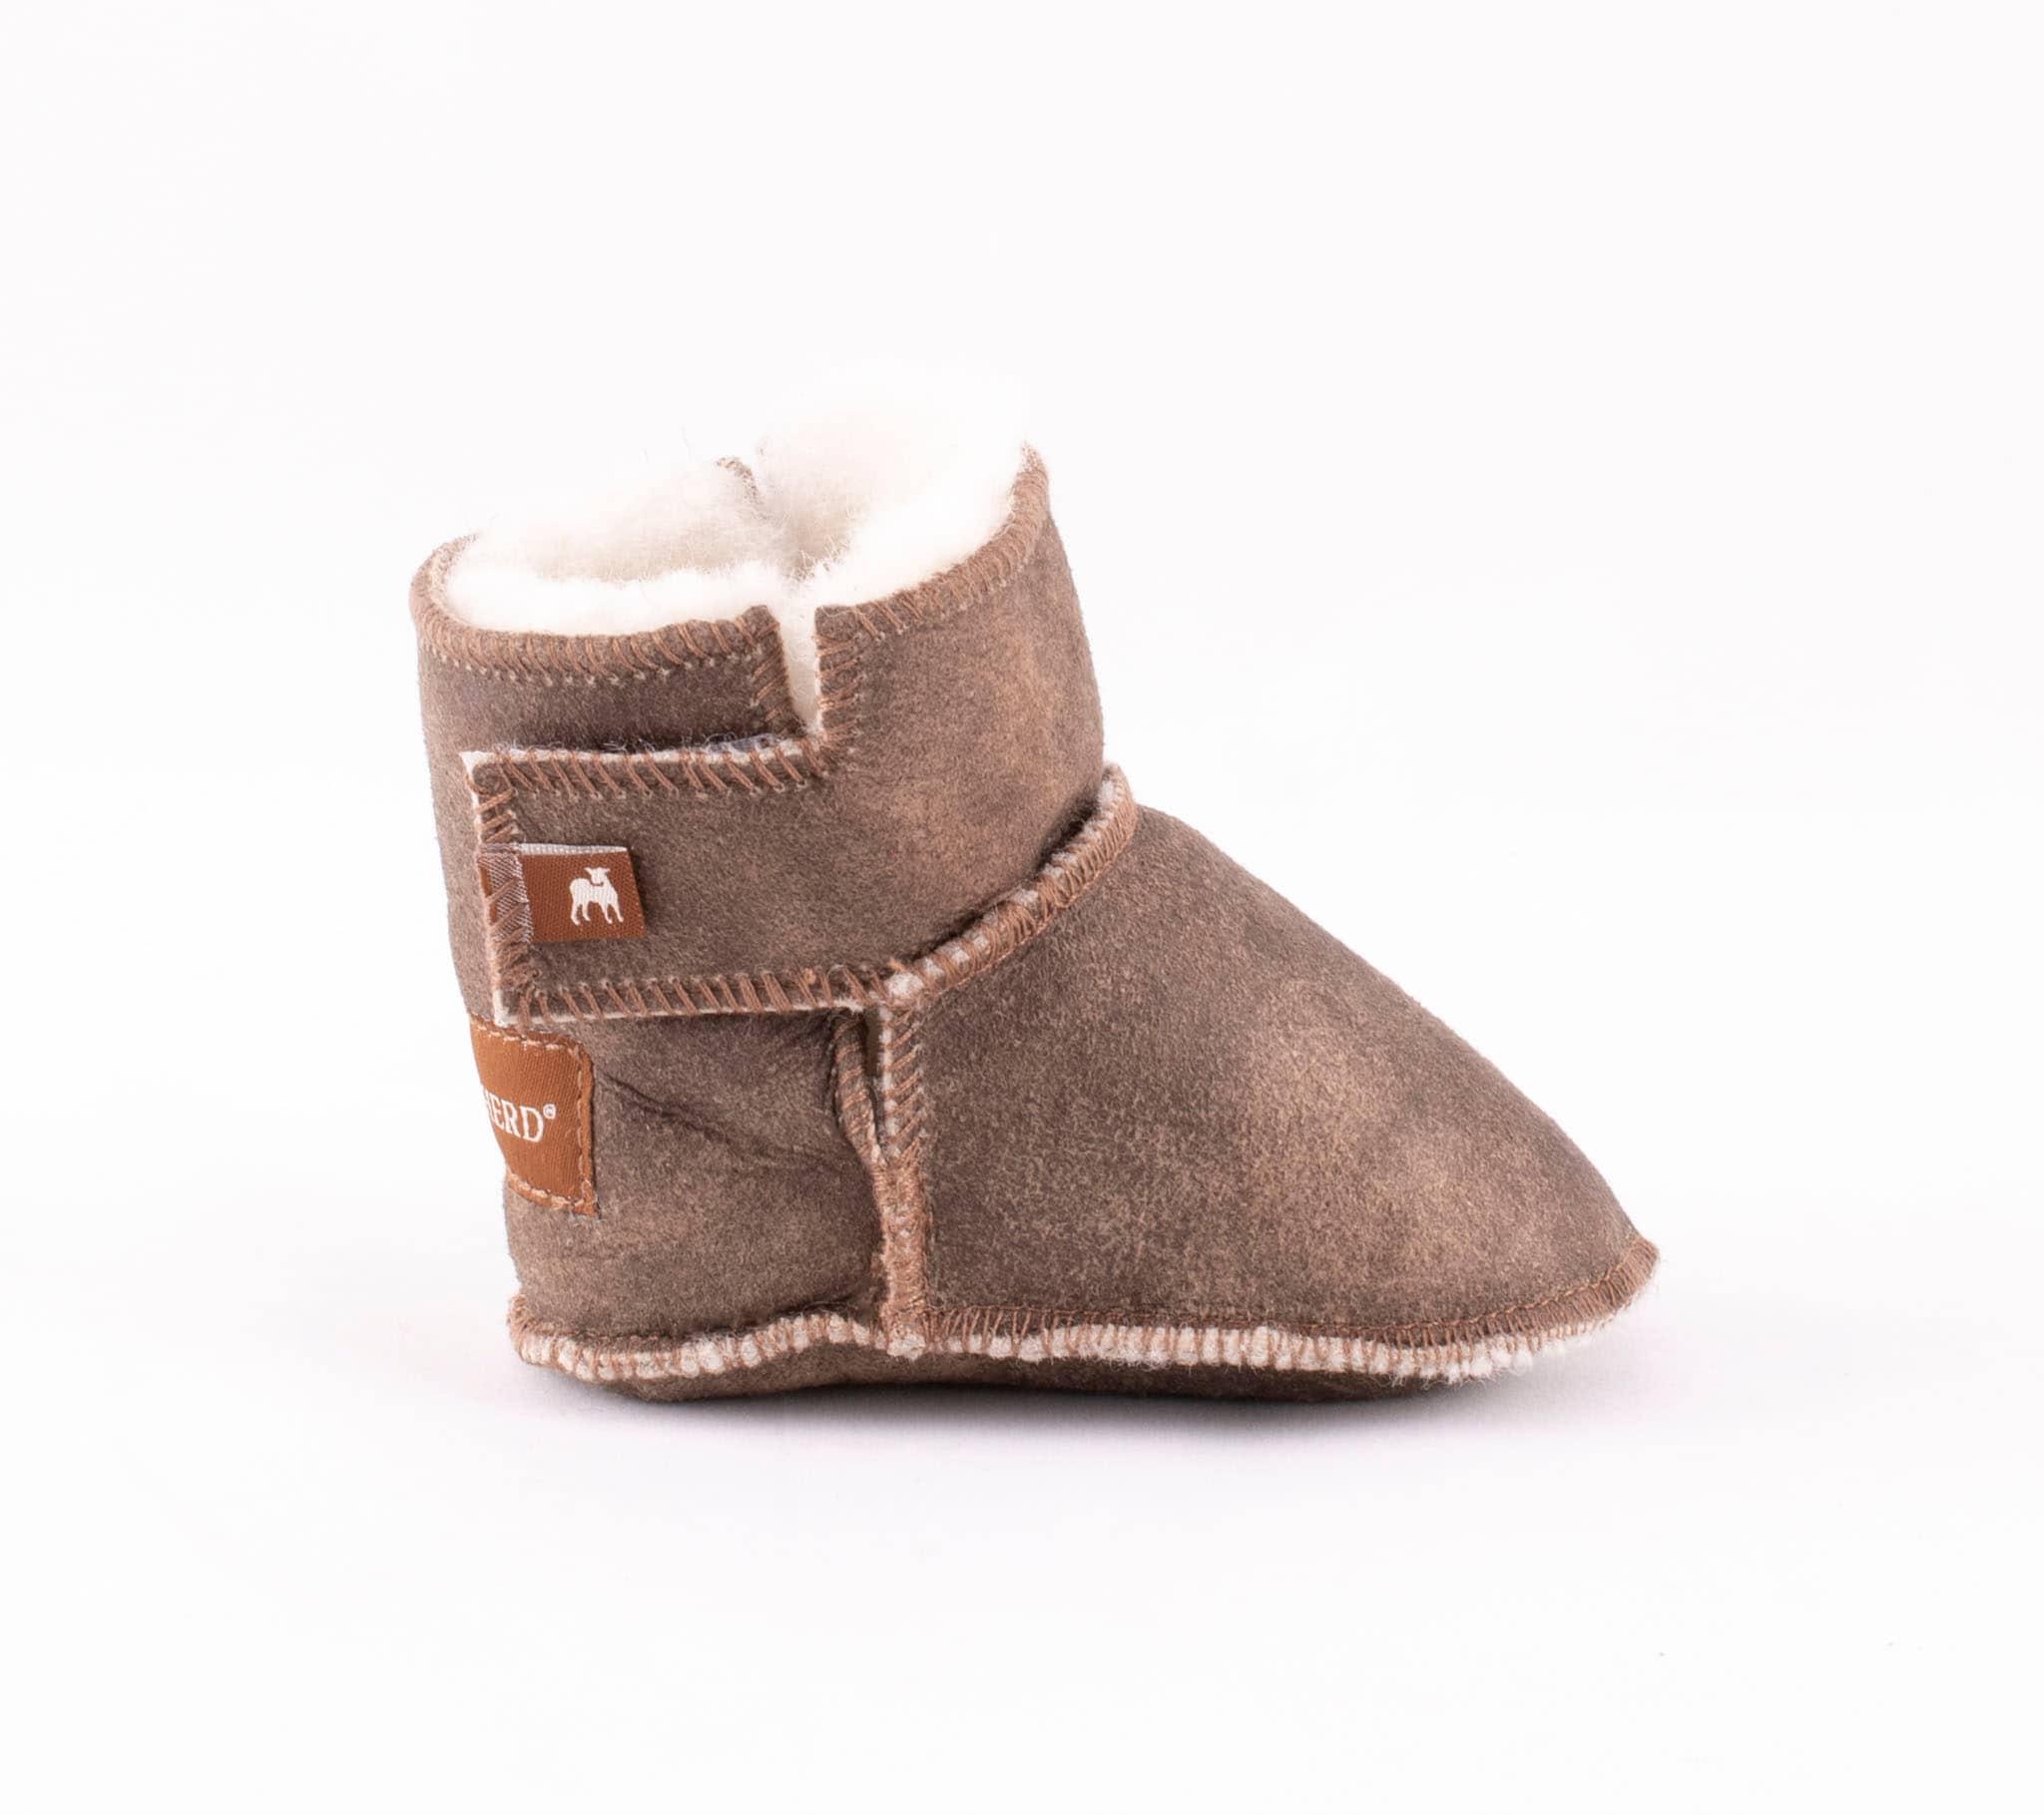 Borås baby slippers Antique creme